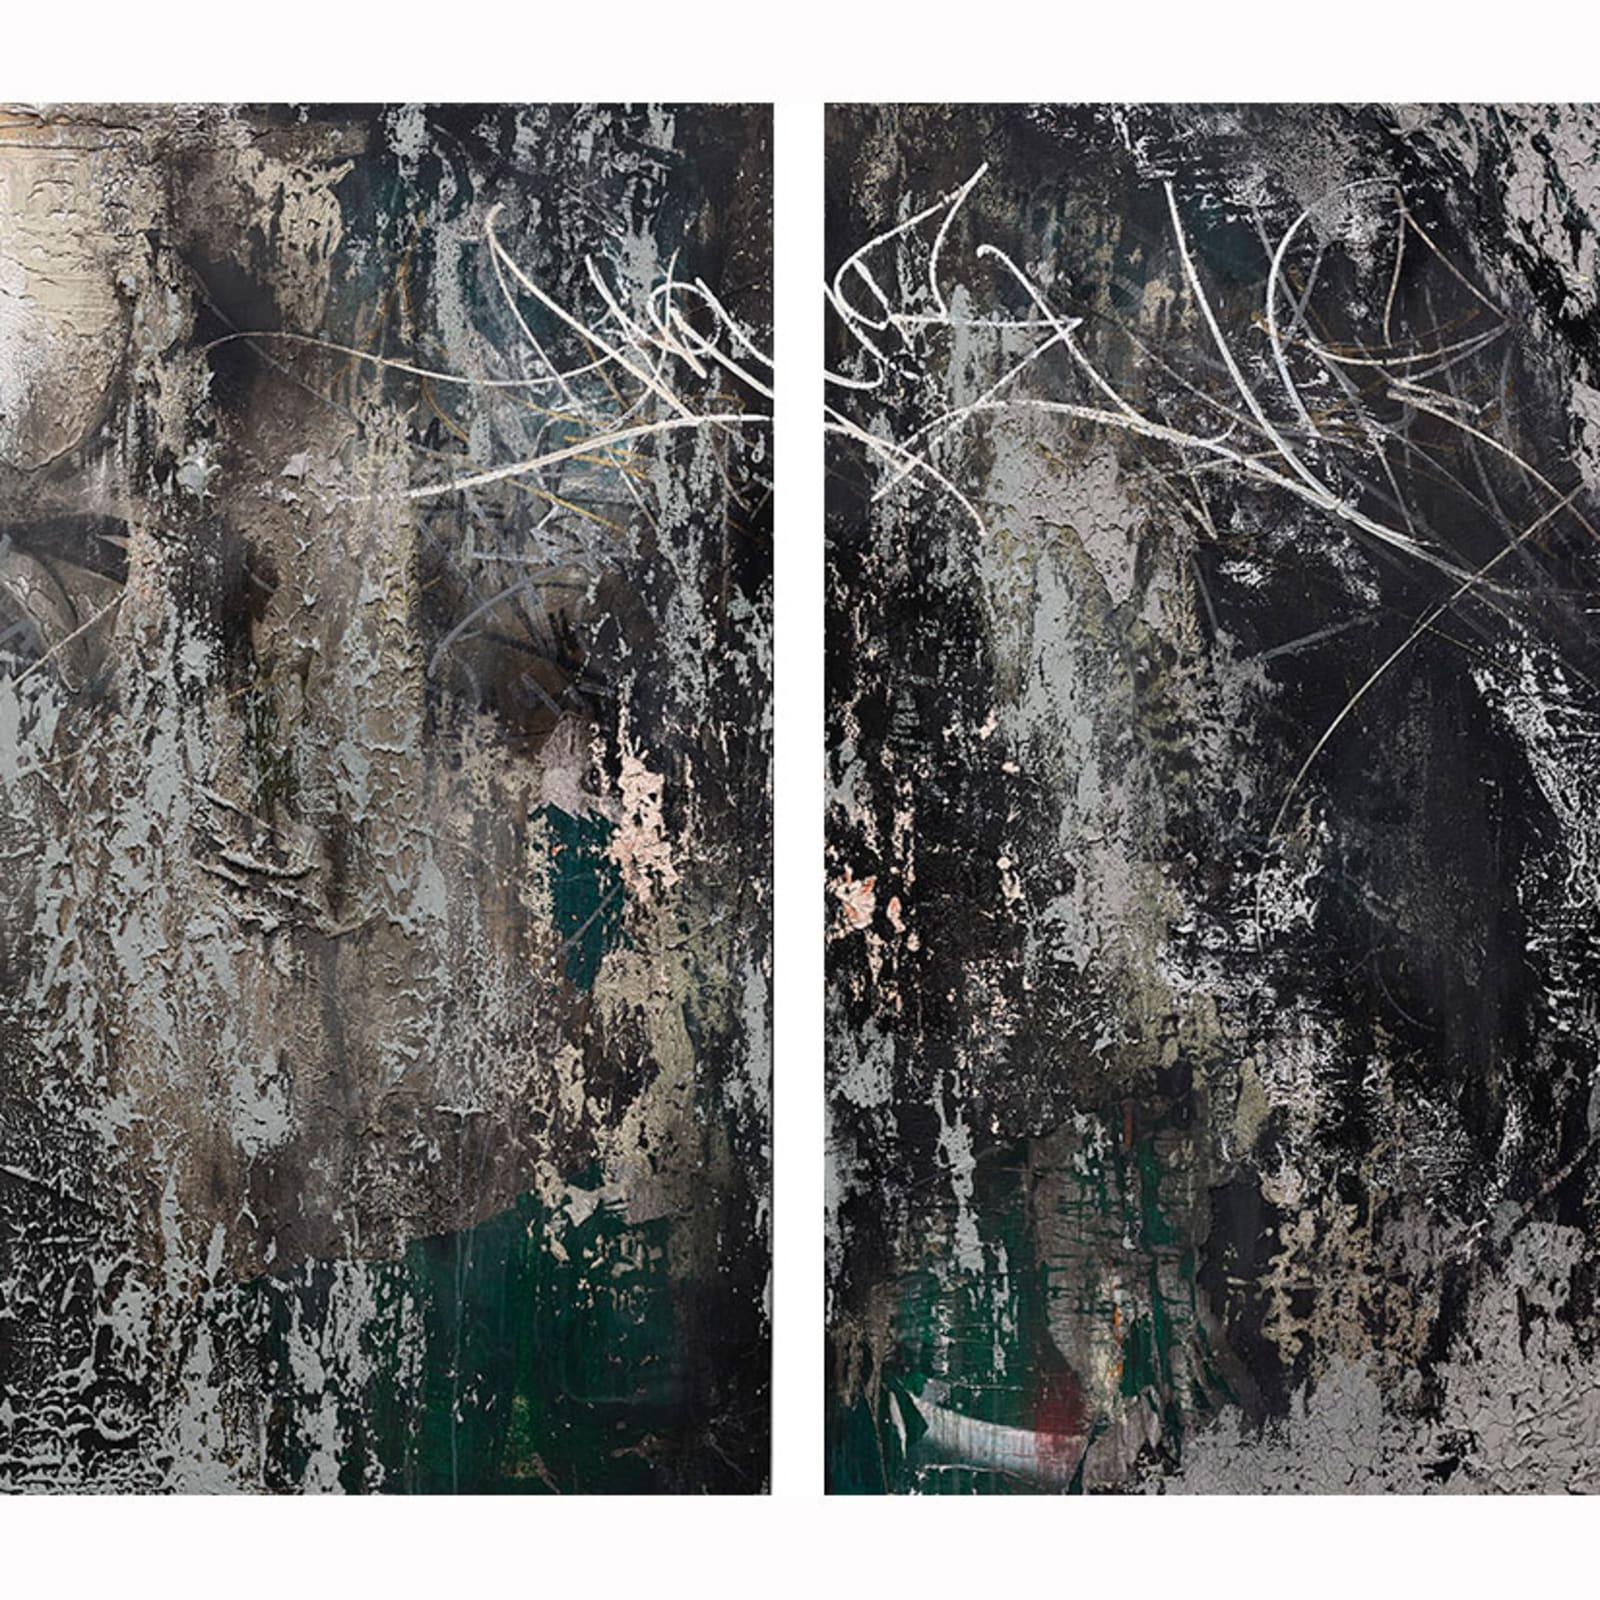 José Parlá, Mannerisms of Decay, 2018